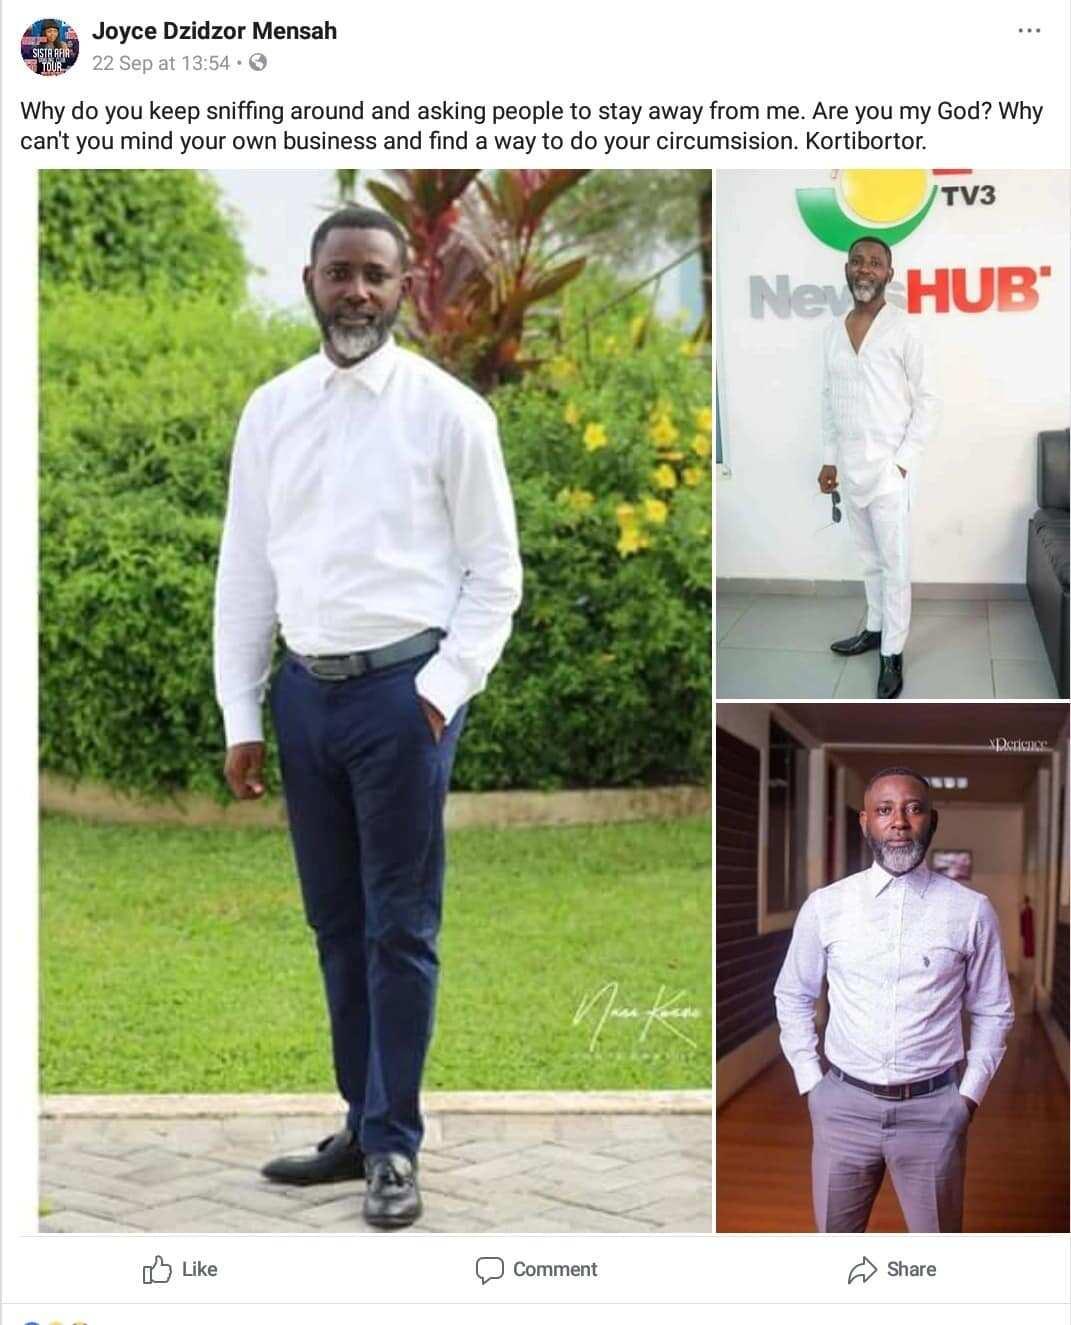 Root Eye is an 'uncircumcised' man - Joyce Dzidzor Mensah claims